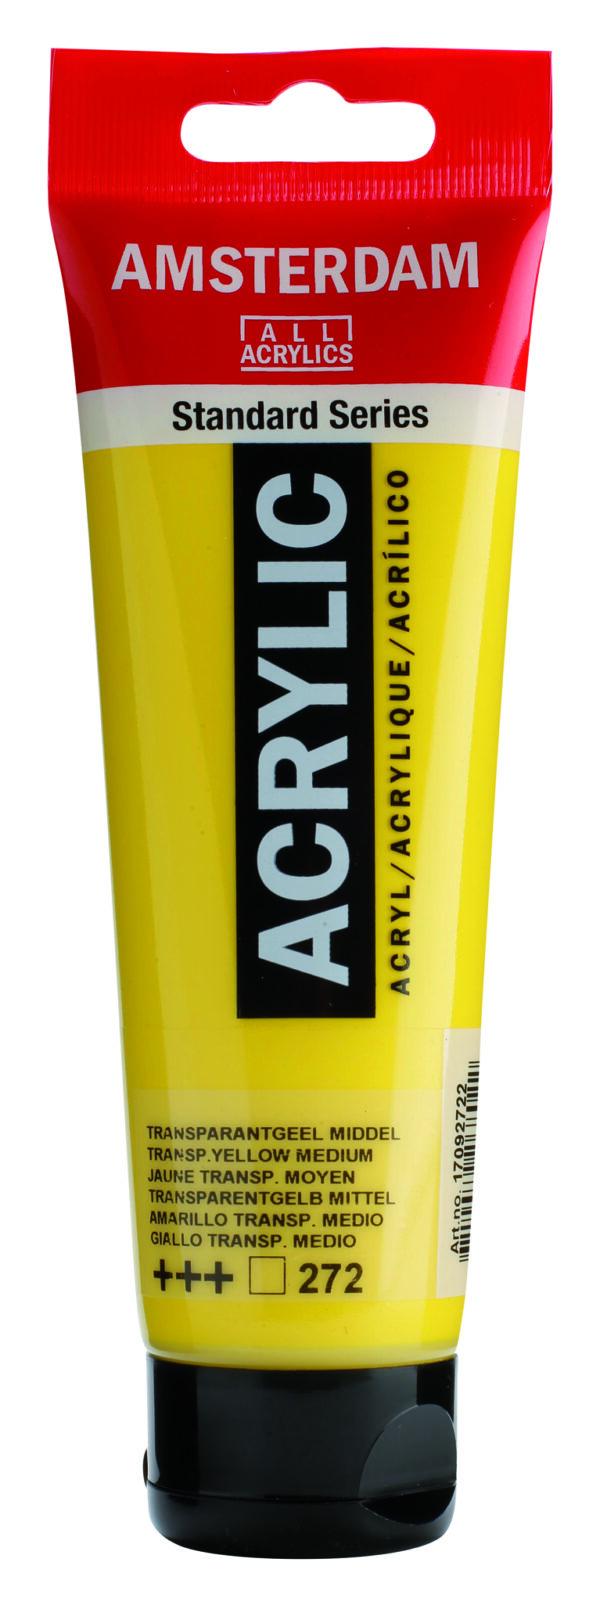 Ams std 272 Transparent yellow Medium - 120 ml